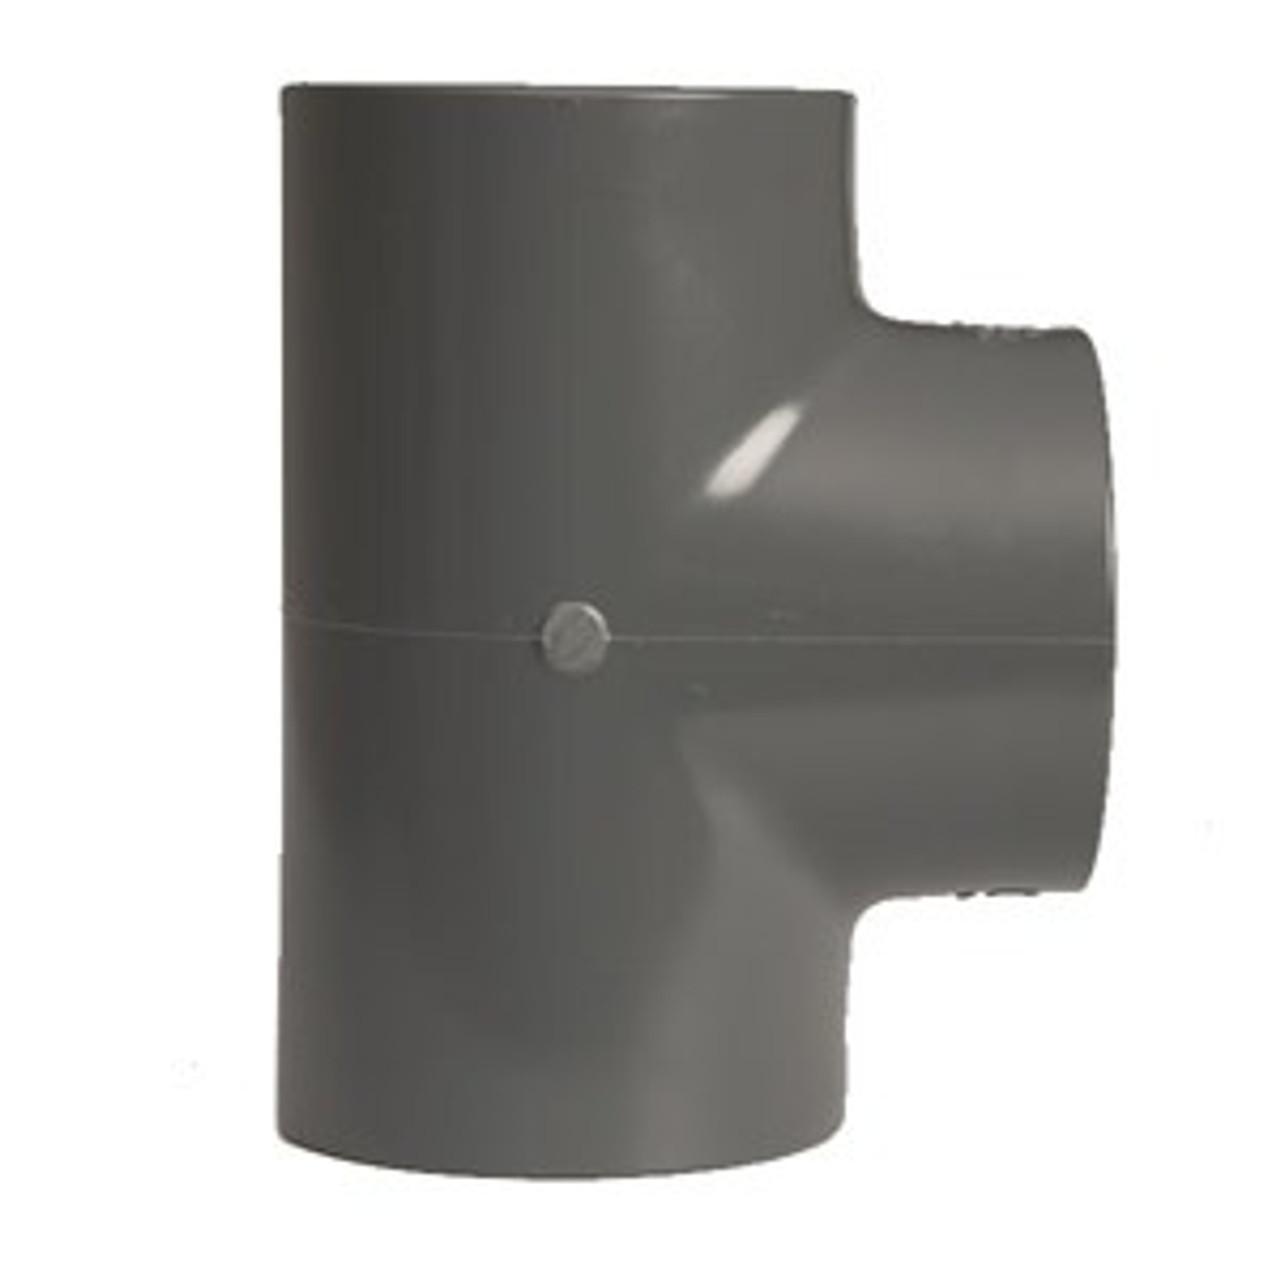 +GF+   Tee 90 Equal PVC-U 50mm (721200110)